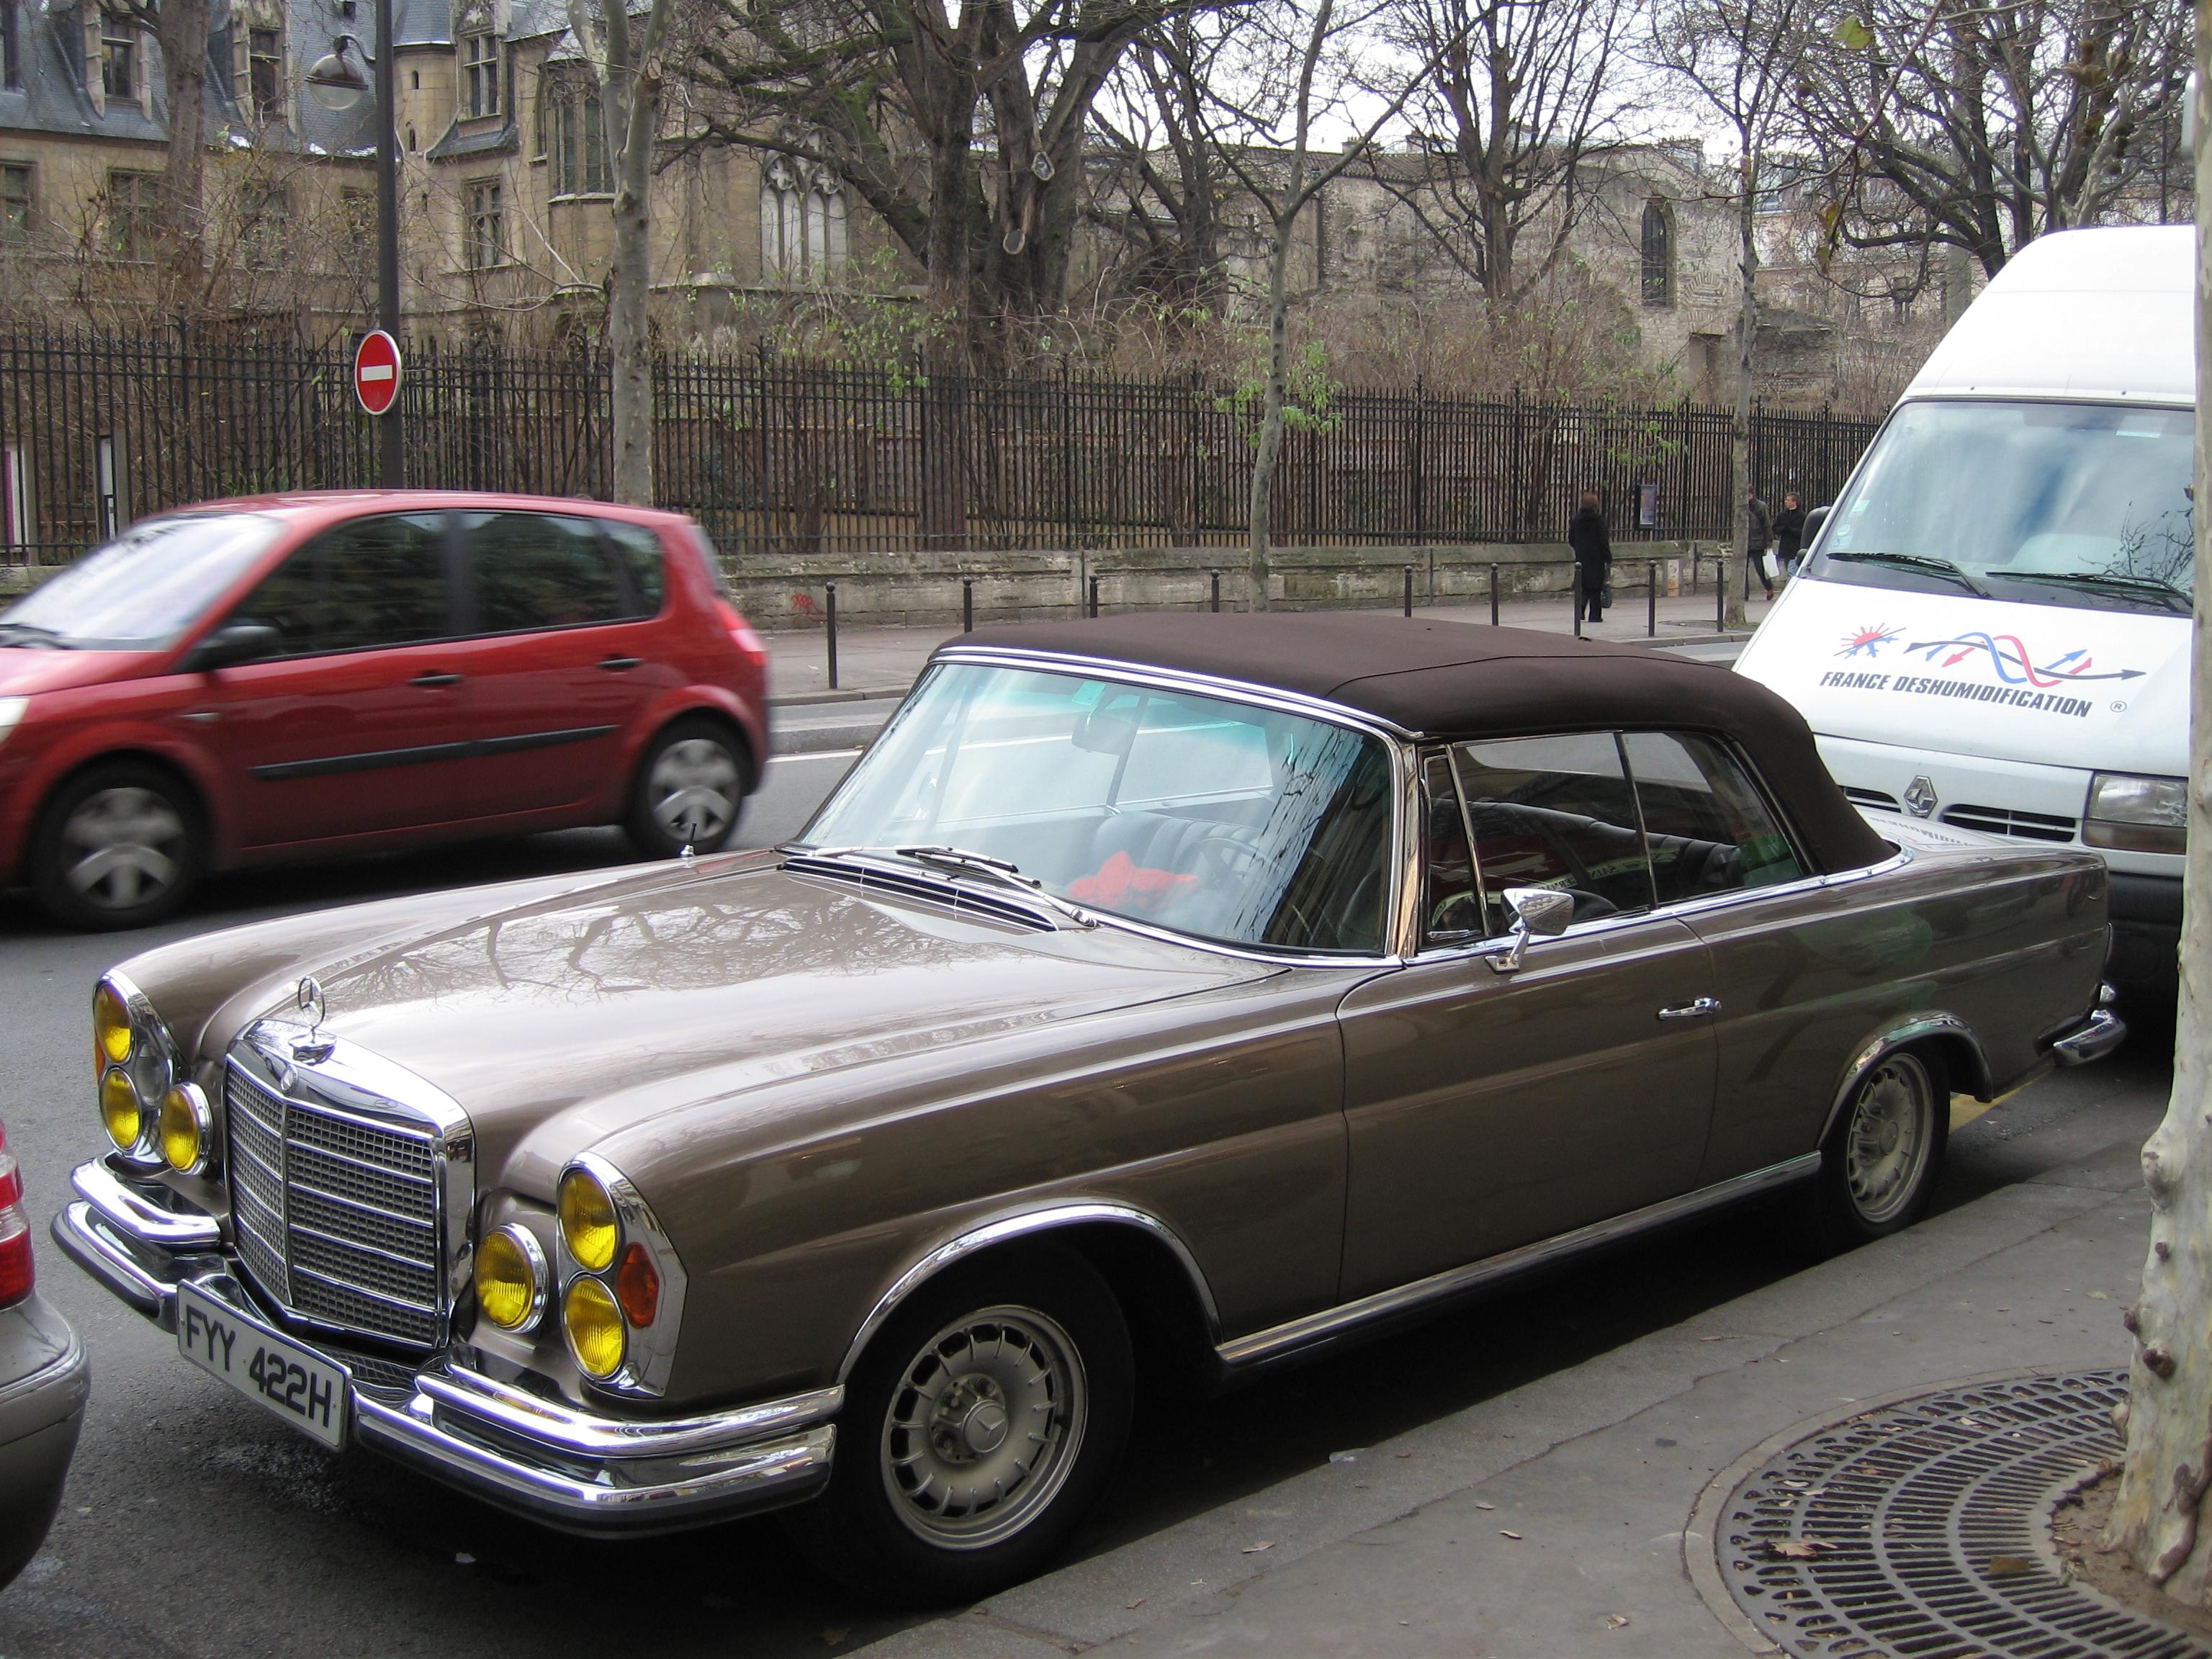 File:Mercedes 280, St.-Germain.jpg - Wikimedia Commons